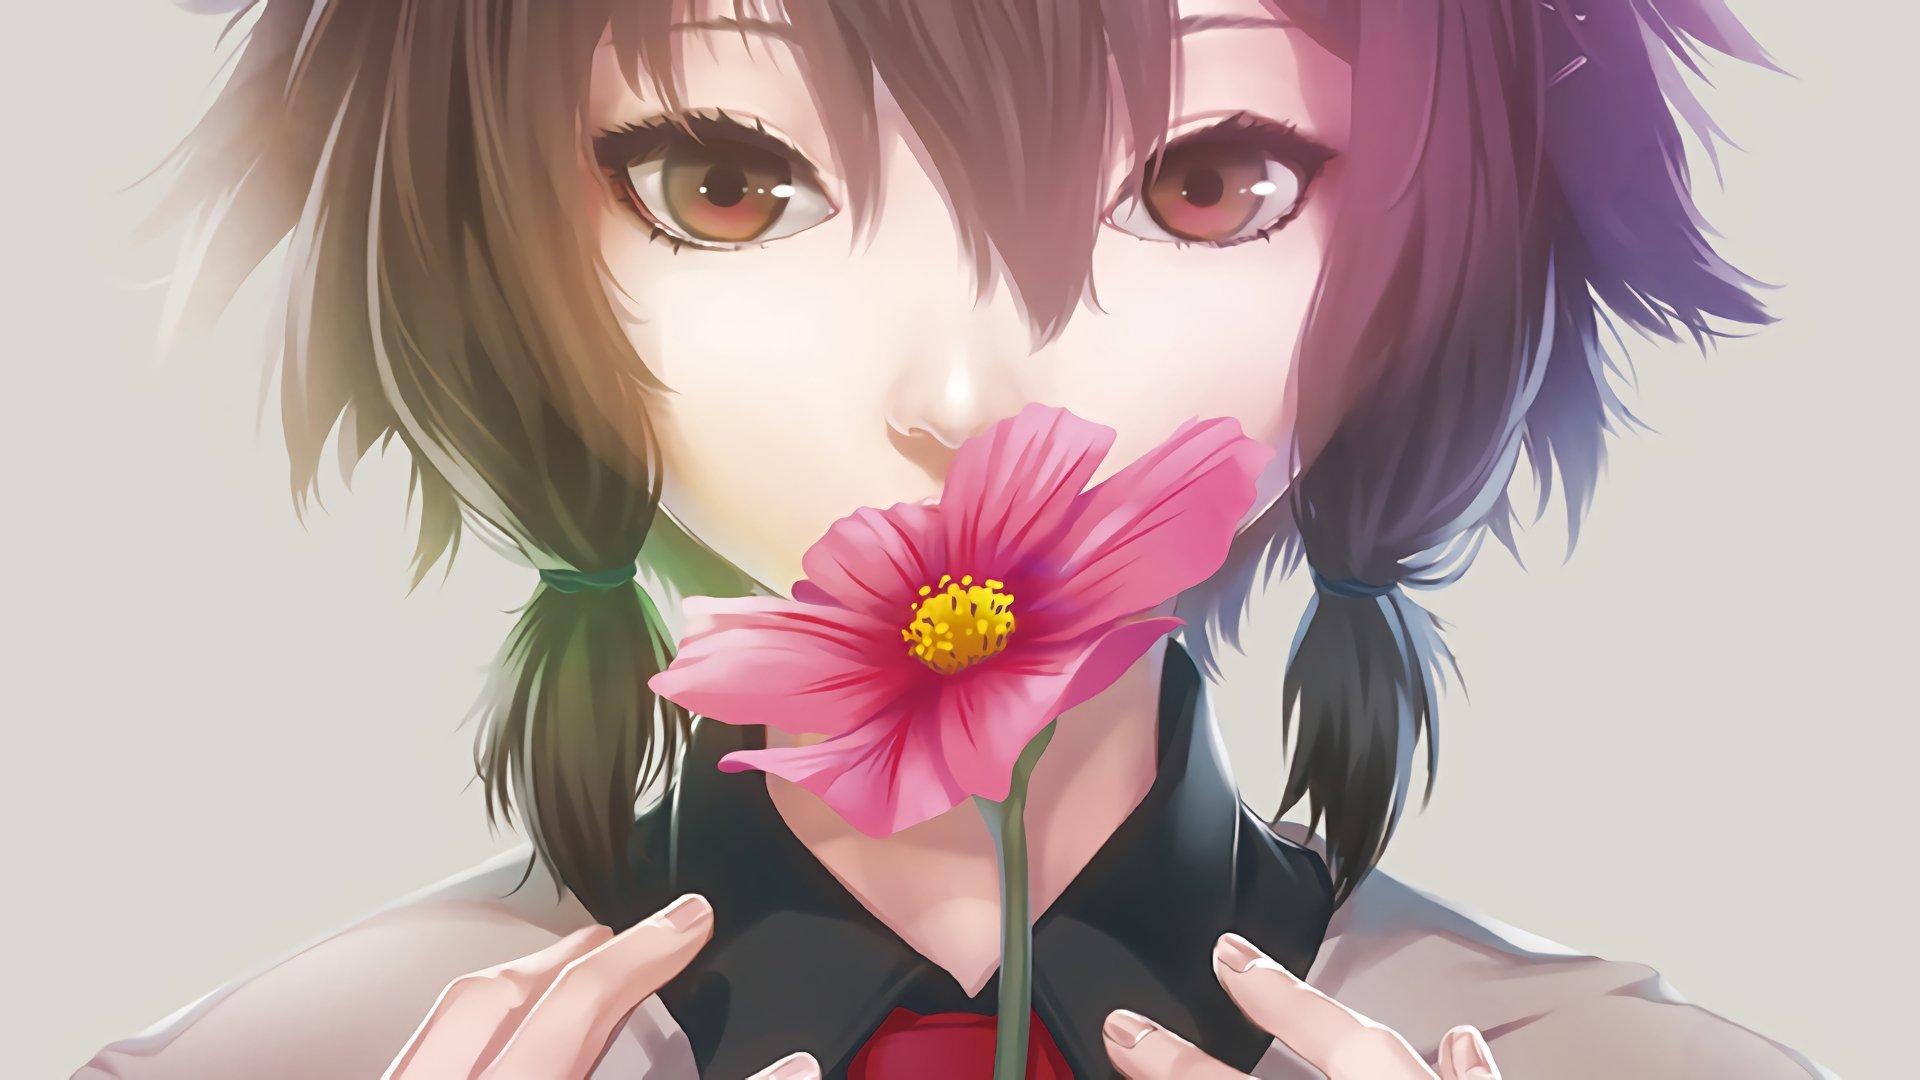 Anime Girls Wallpaper Pc